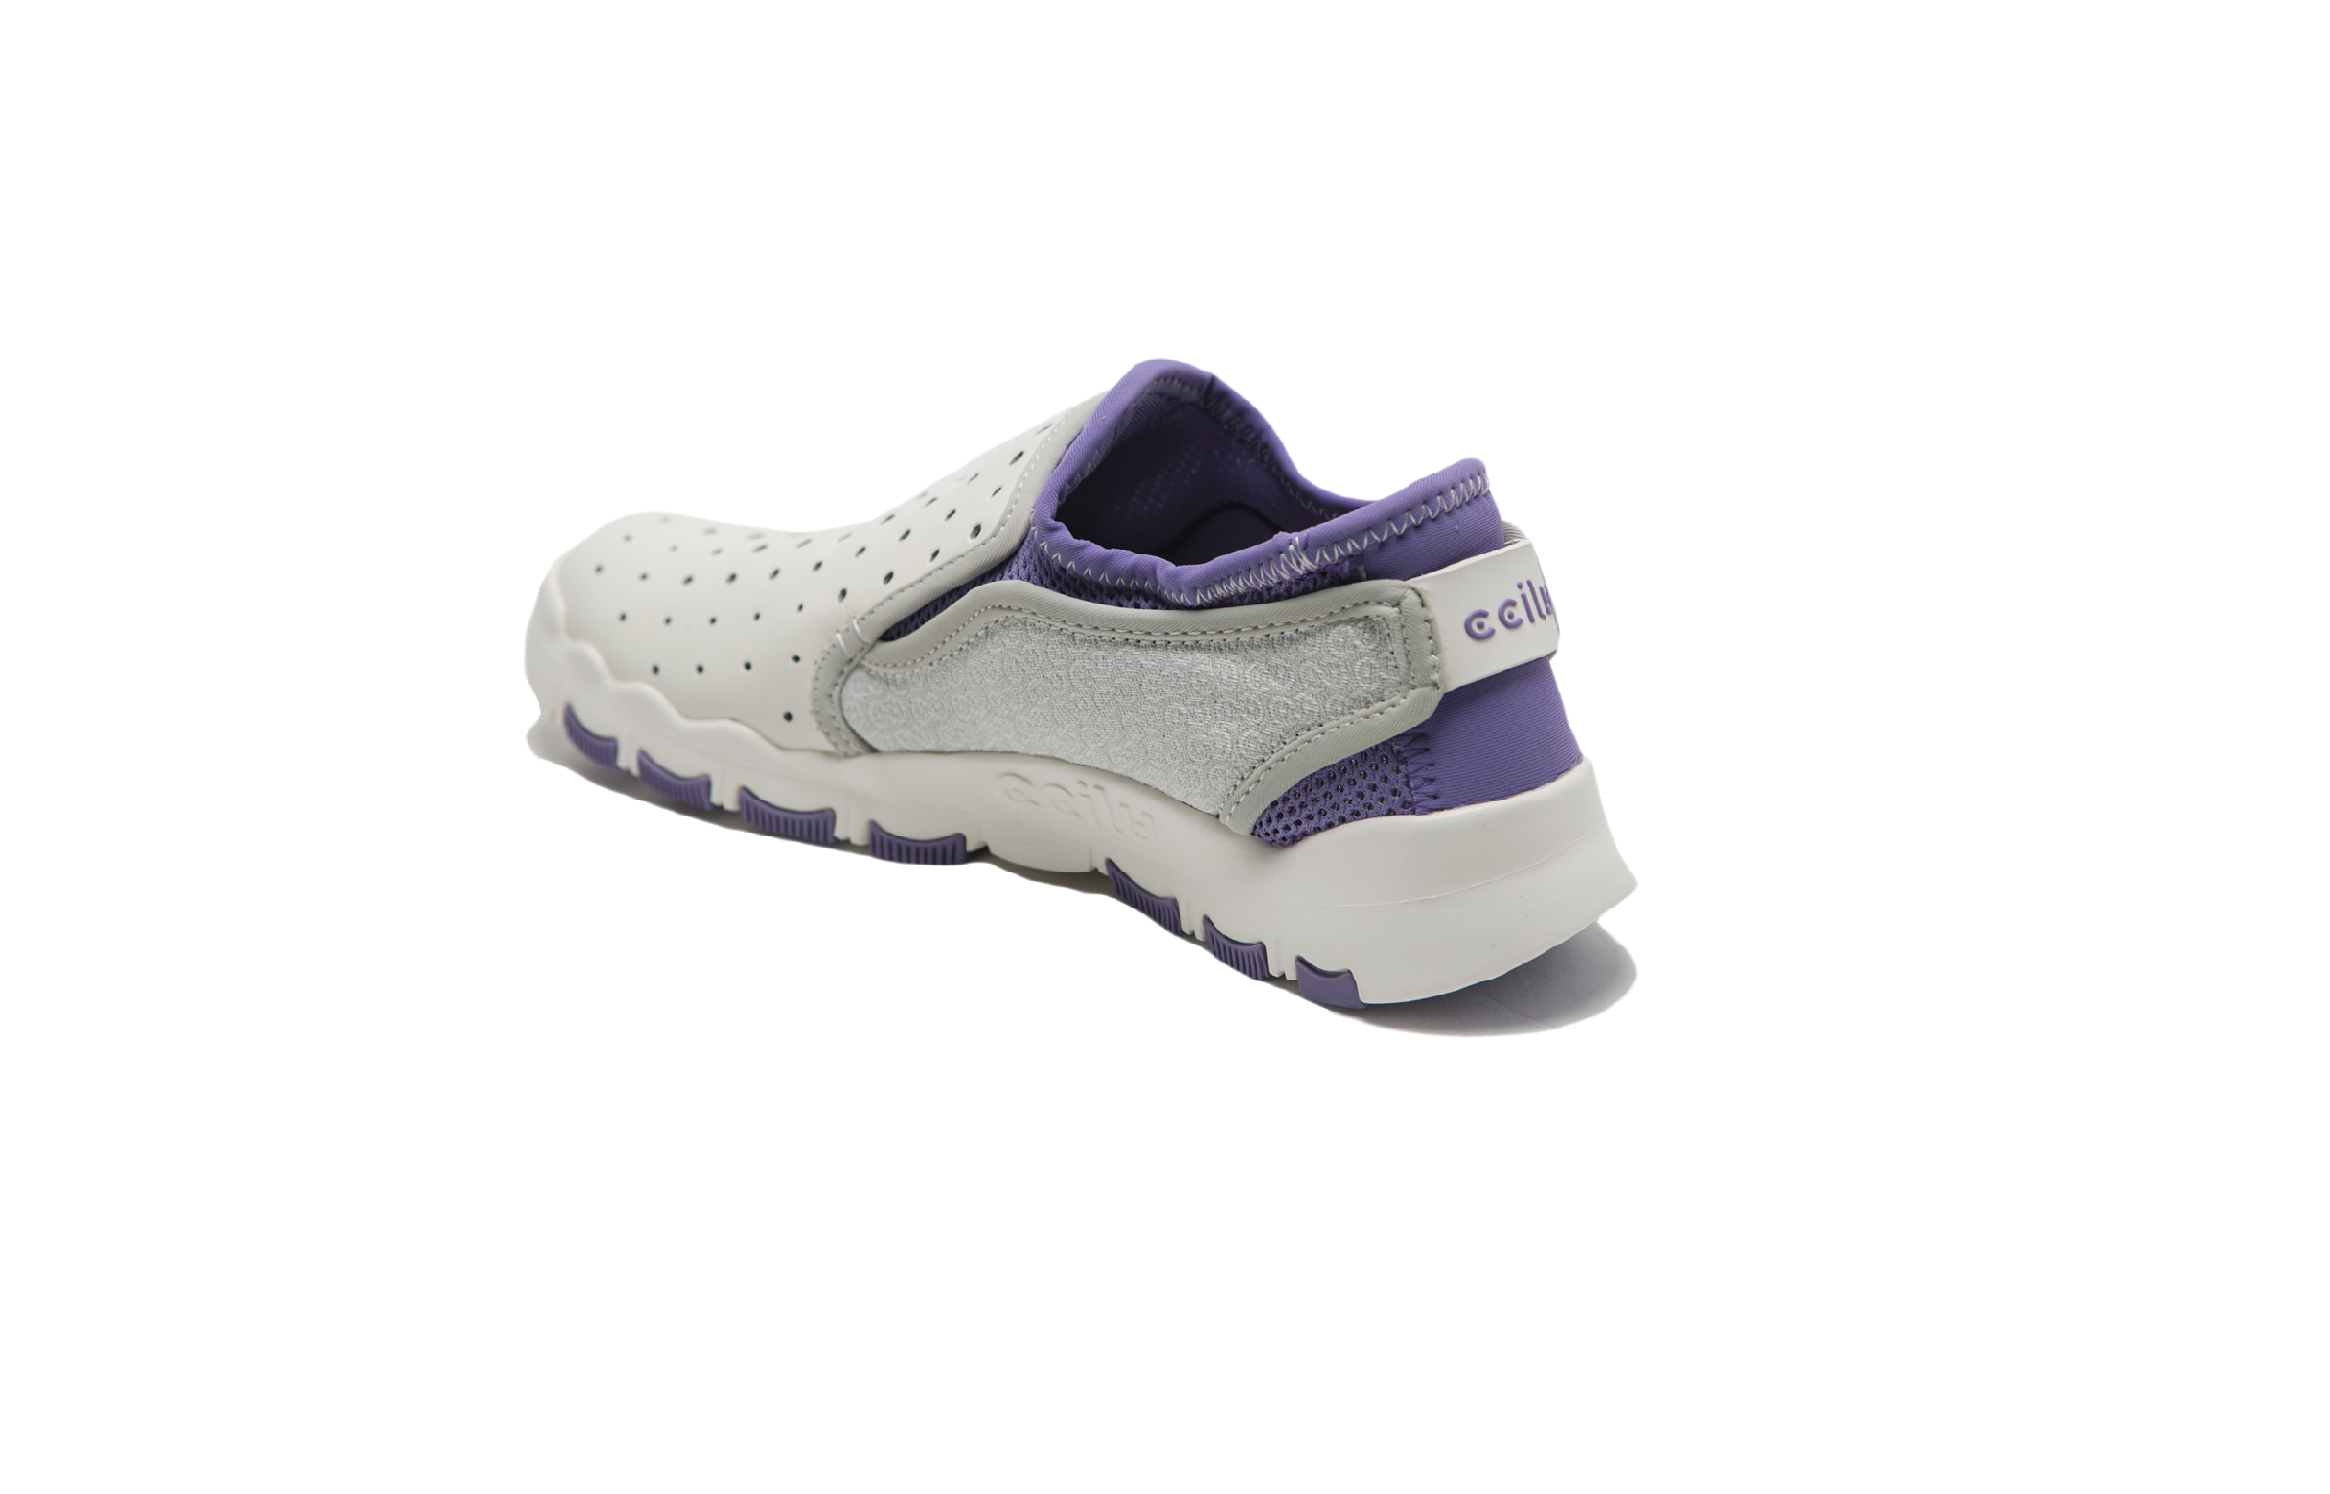 02b9d25095f03 Ccilu Burch Wax Walking Shoes - Women